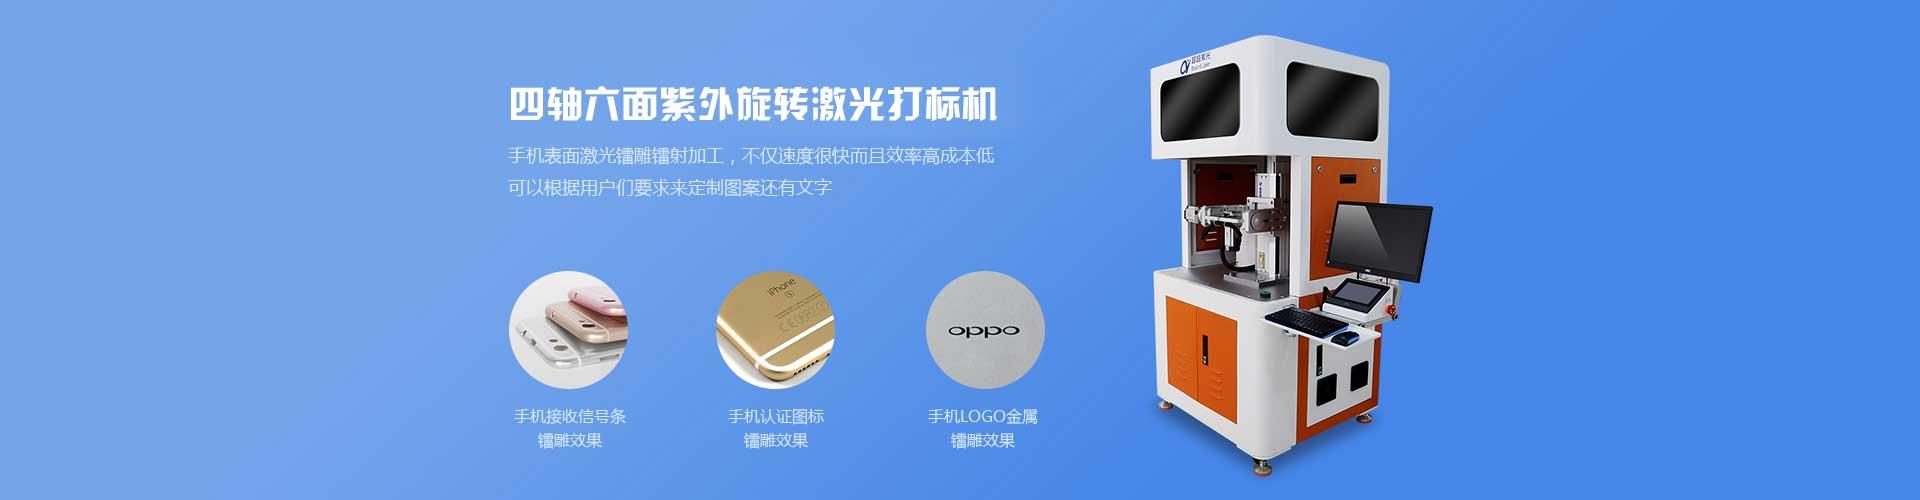 ca88会员登录|ca88亚洲城官网会员登录,欢迎光临_紫光3D镭雕机全自动化功能